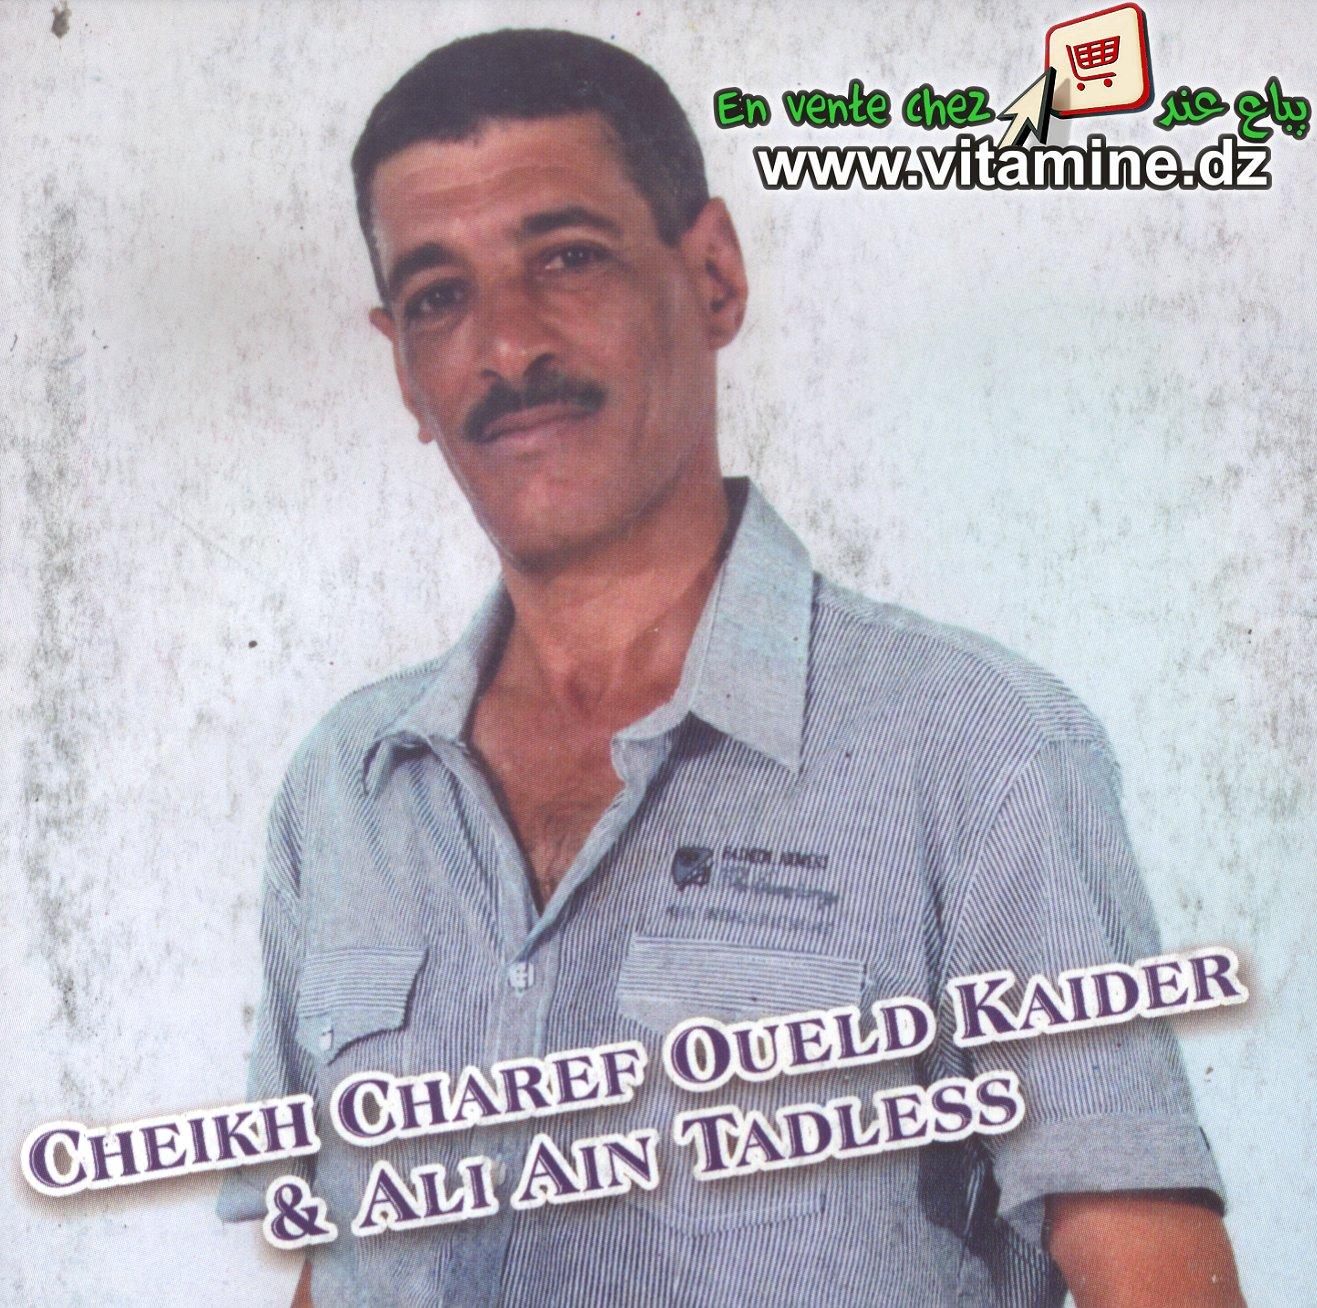 Cheikh Charef Oueld Kaider & Ali Ain Tadless